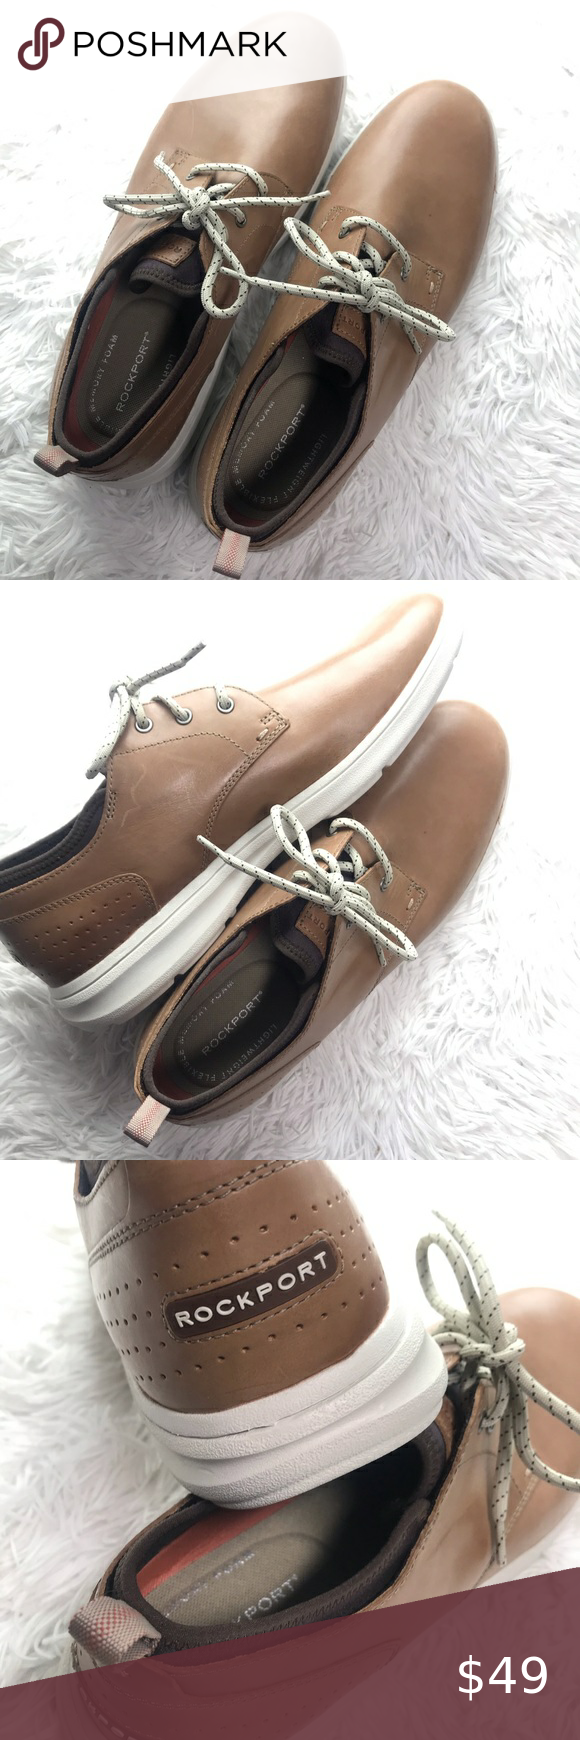 Rockport Memory foam shoes Leather Tie